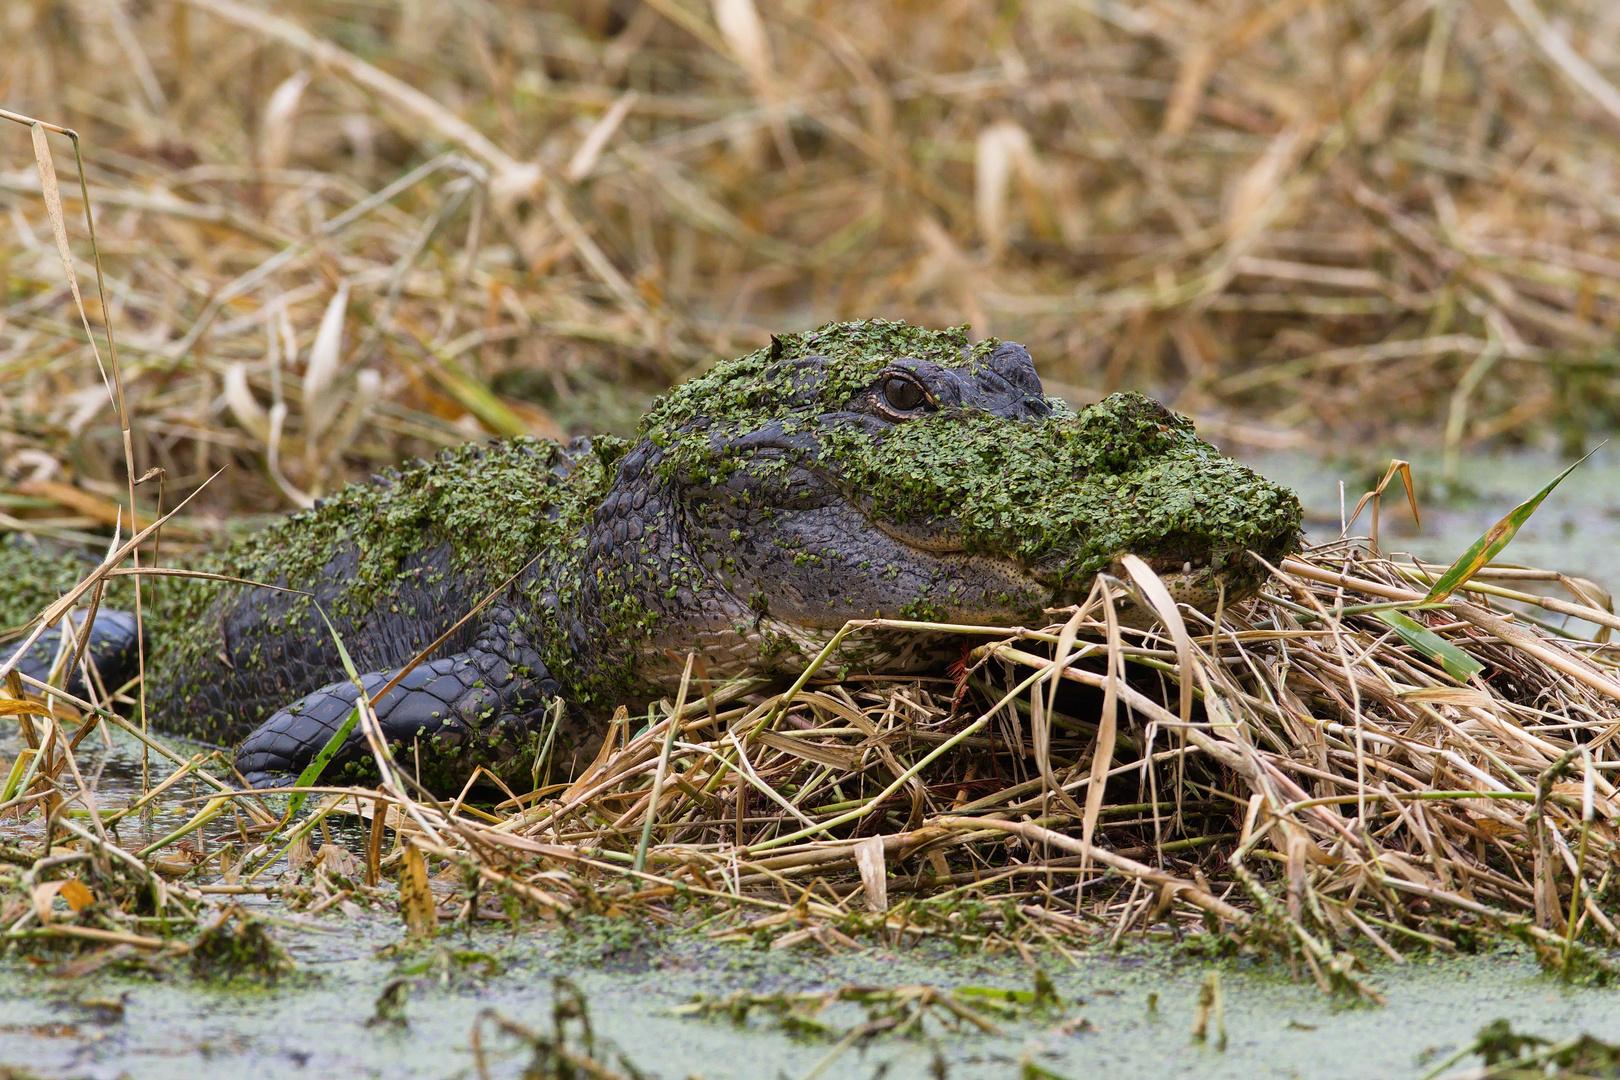 Alligator in Camouflage